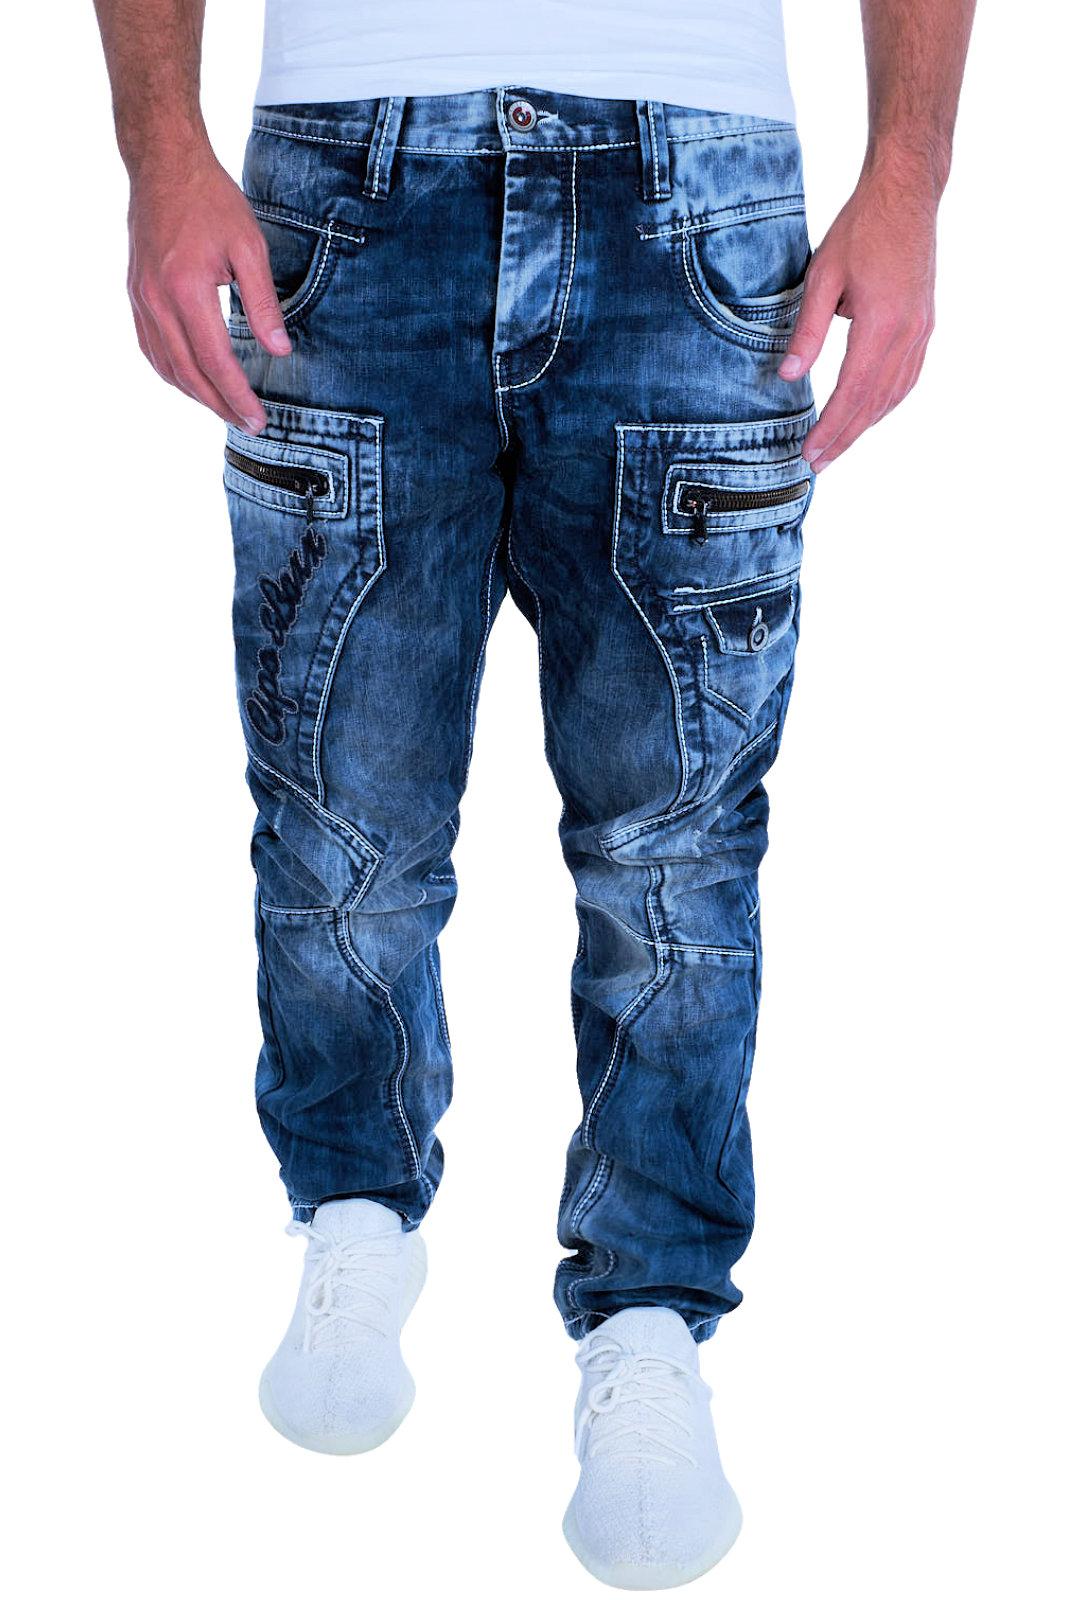 Cipo /& Baxx Uomo Jeans Clubwear Denim Pantaloni c-1149 Straight Spessore Cuciture Nuovo C 11